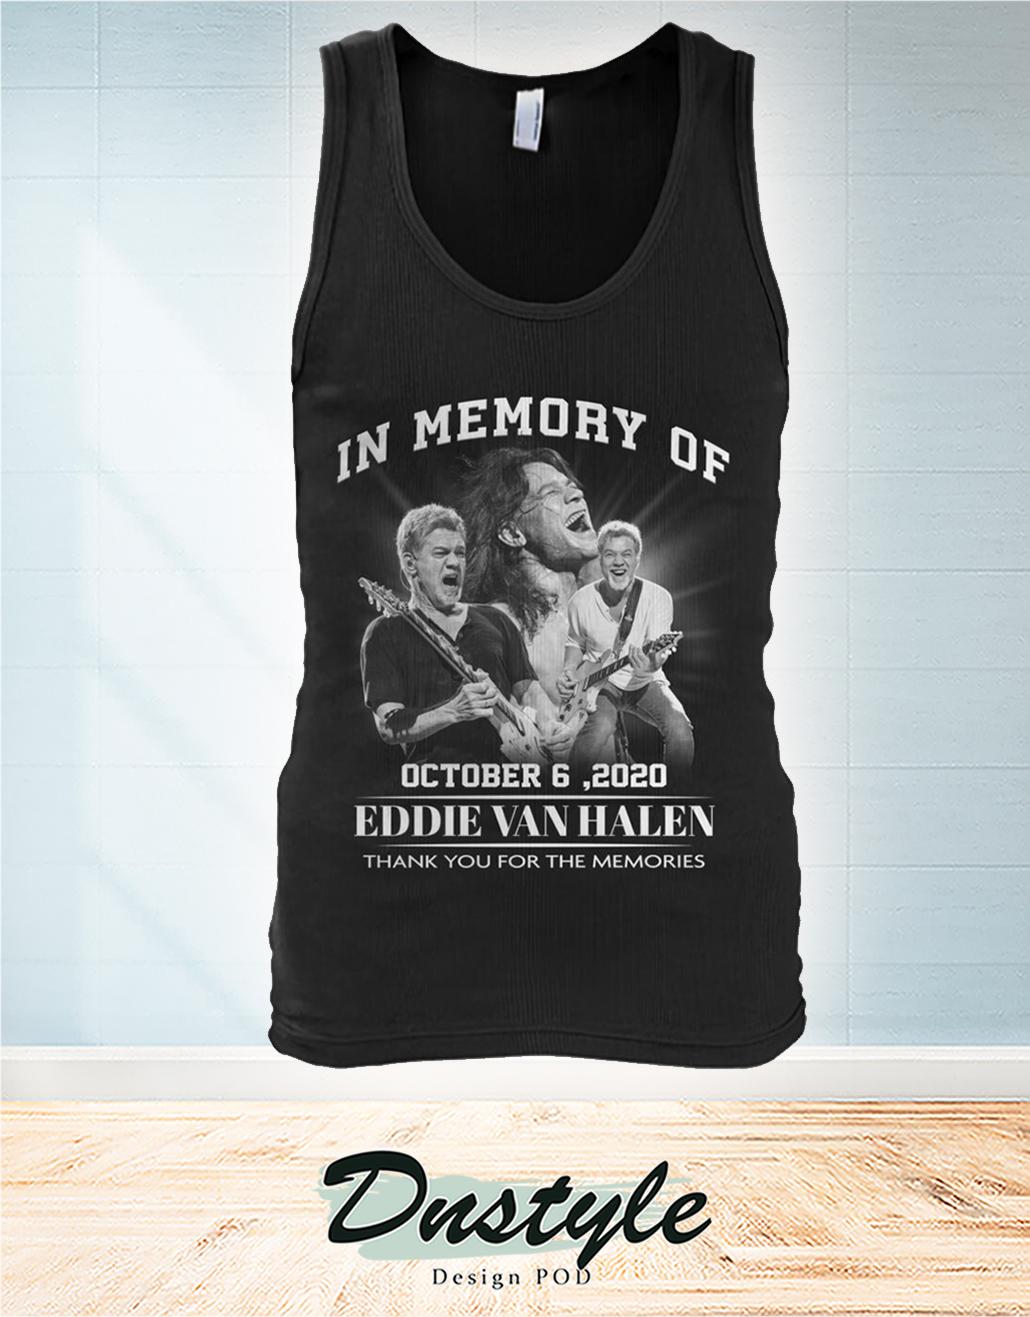 In memory of Eddie Van Halen october 6 2020 tank